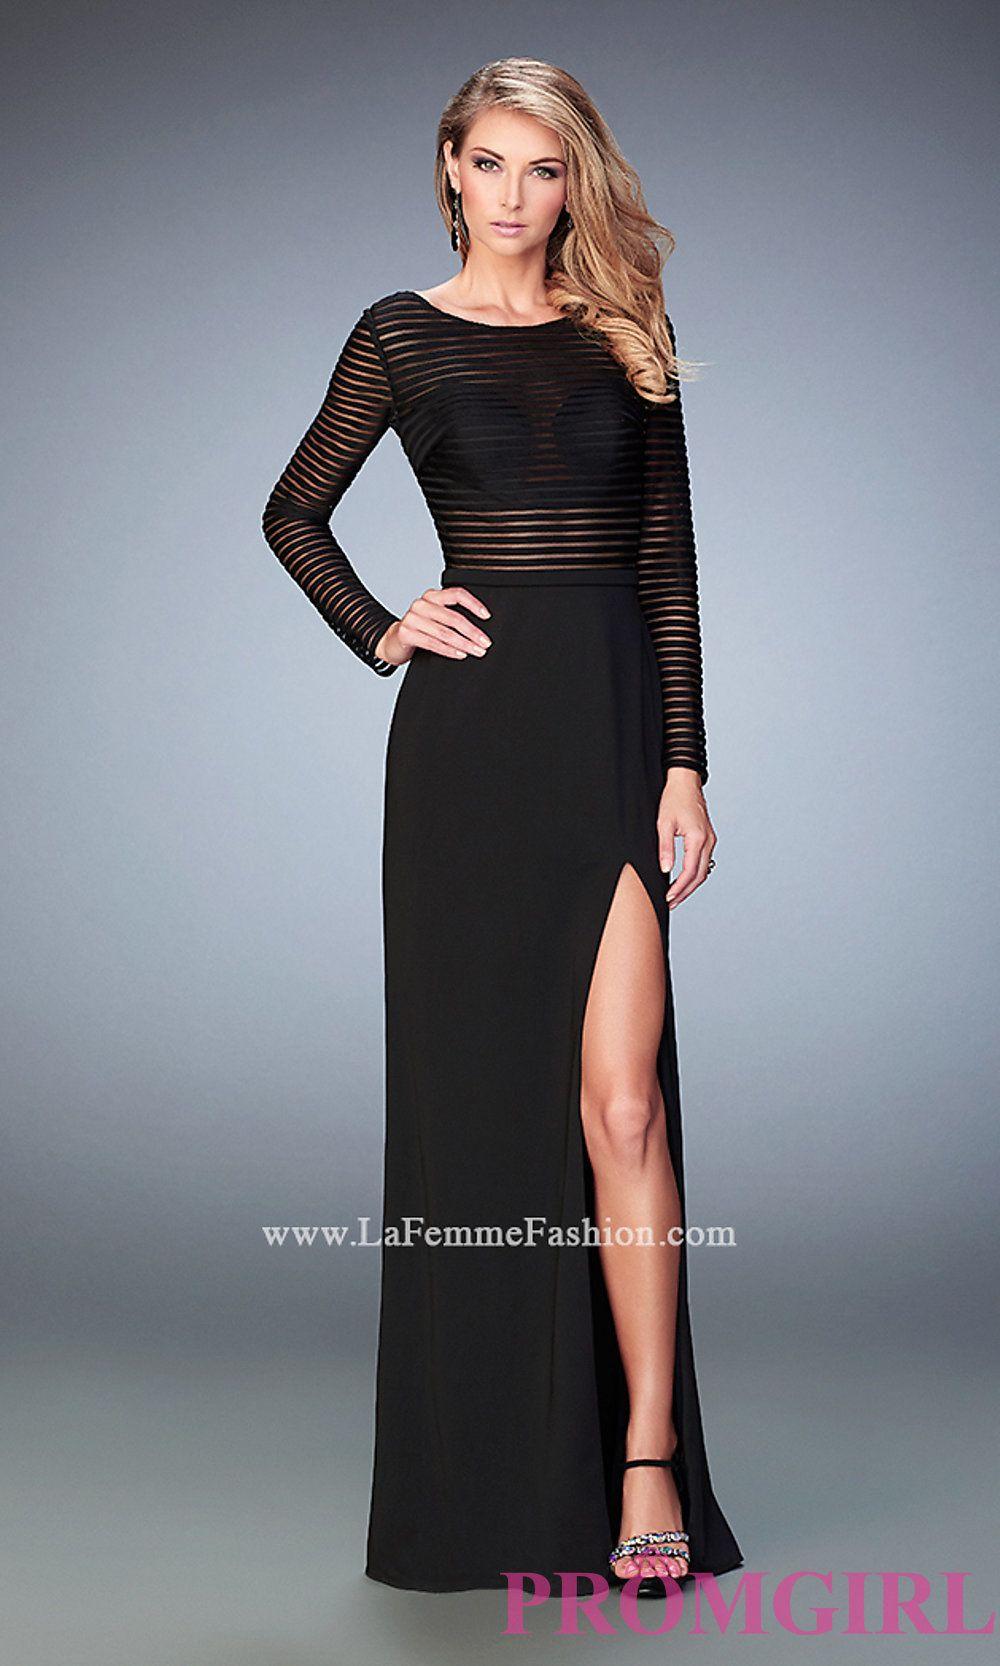 Long la femme black long sleeve prom dress style lf dresses